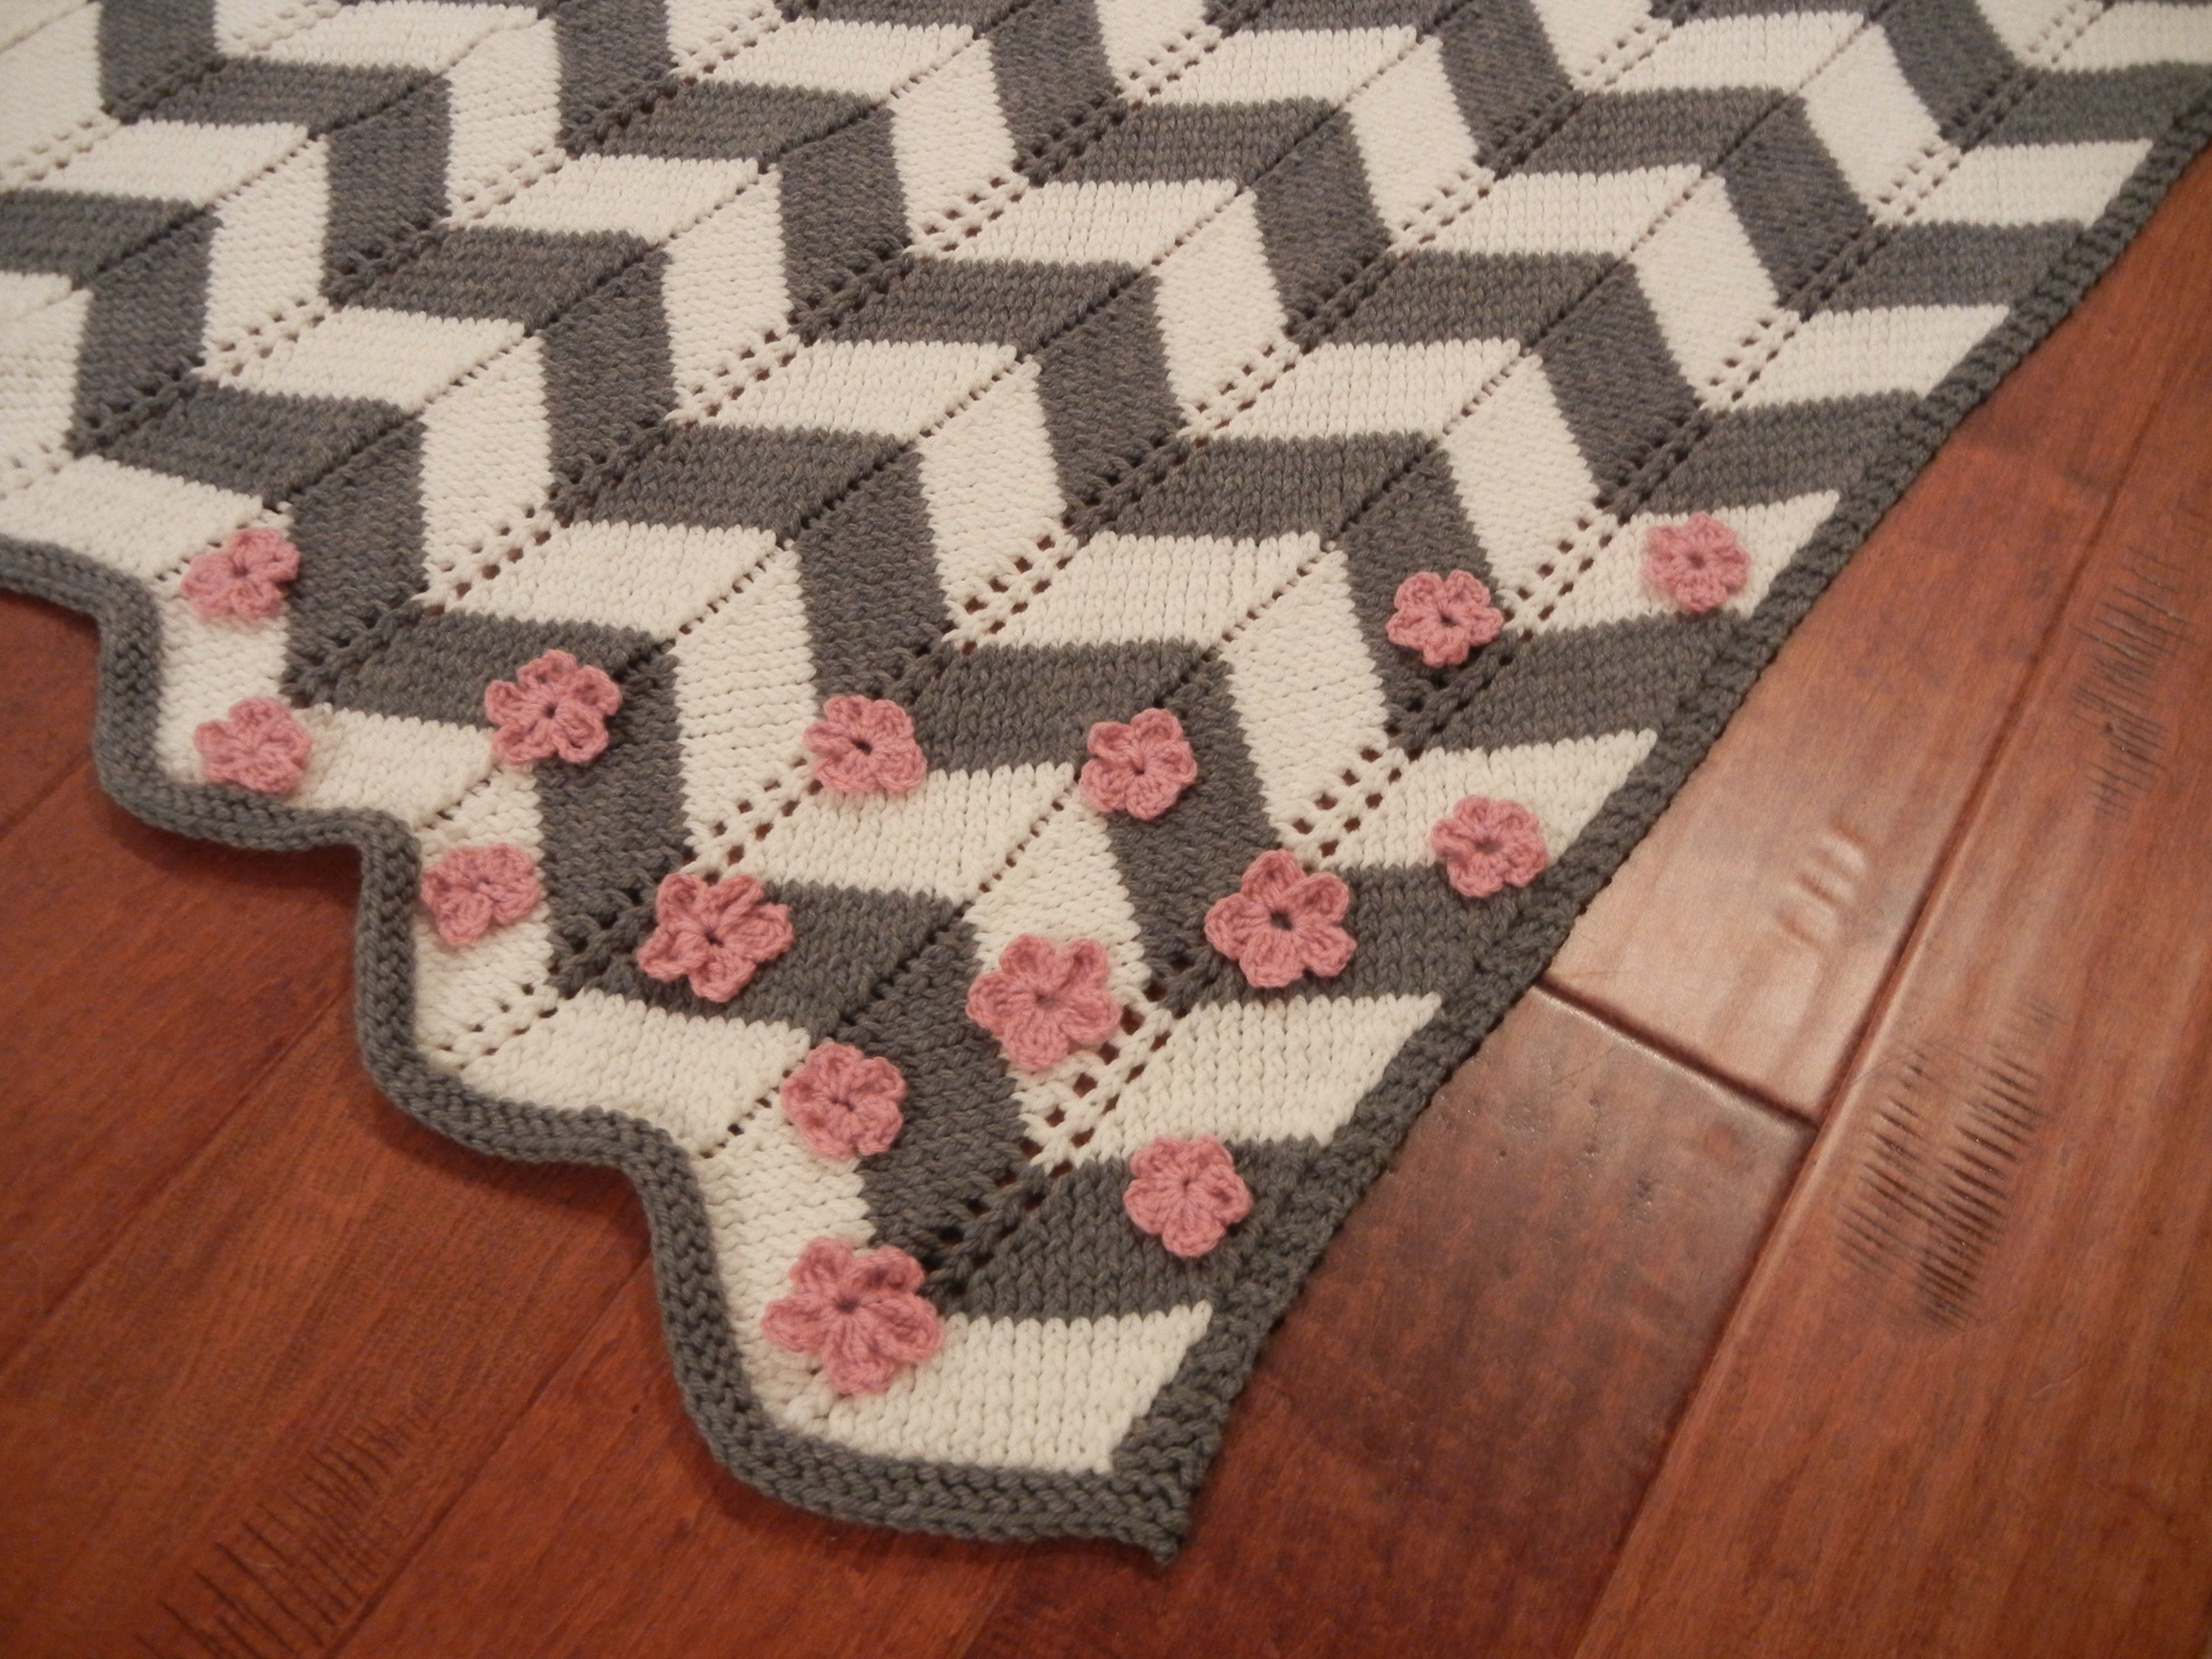 Crocheted Flowers on Baby Blanket